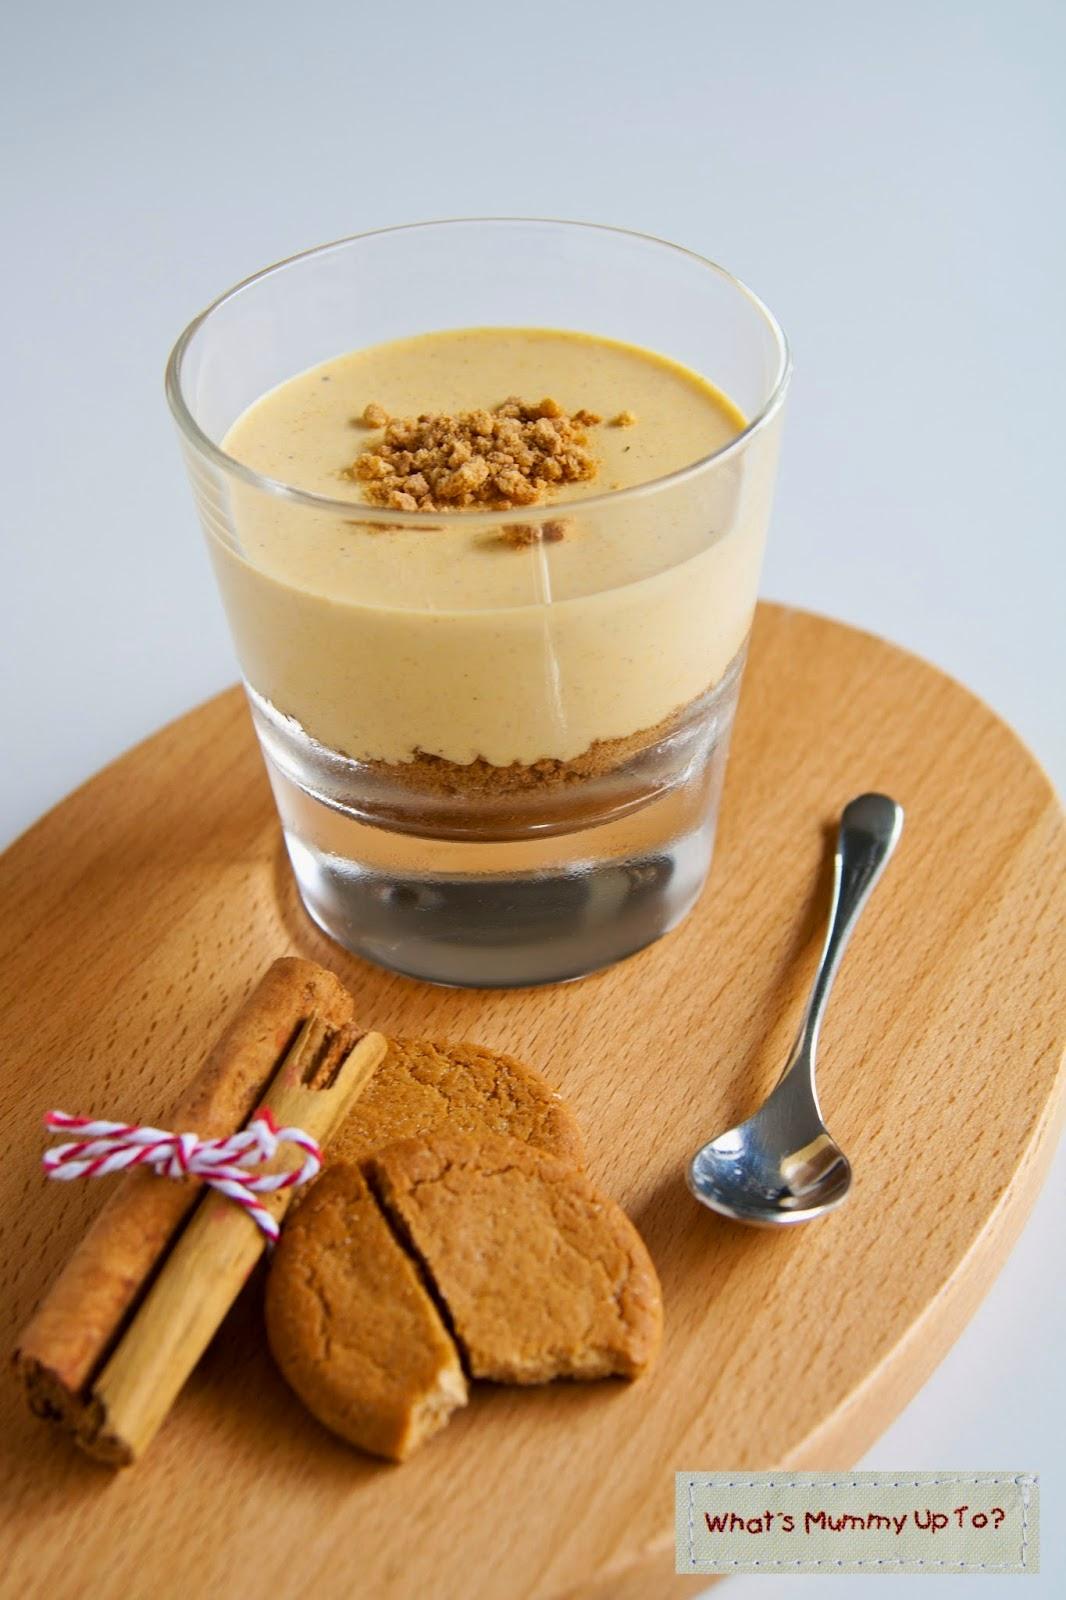 http://whatsmummyupto.blogspot.com.au/2014/09/recipe-pumpkin-cheesecake.html